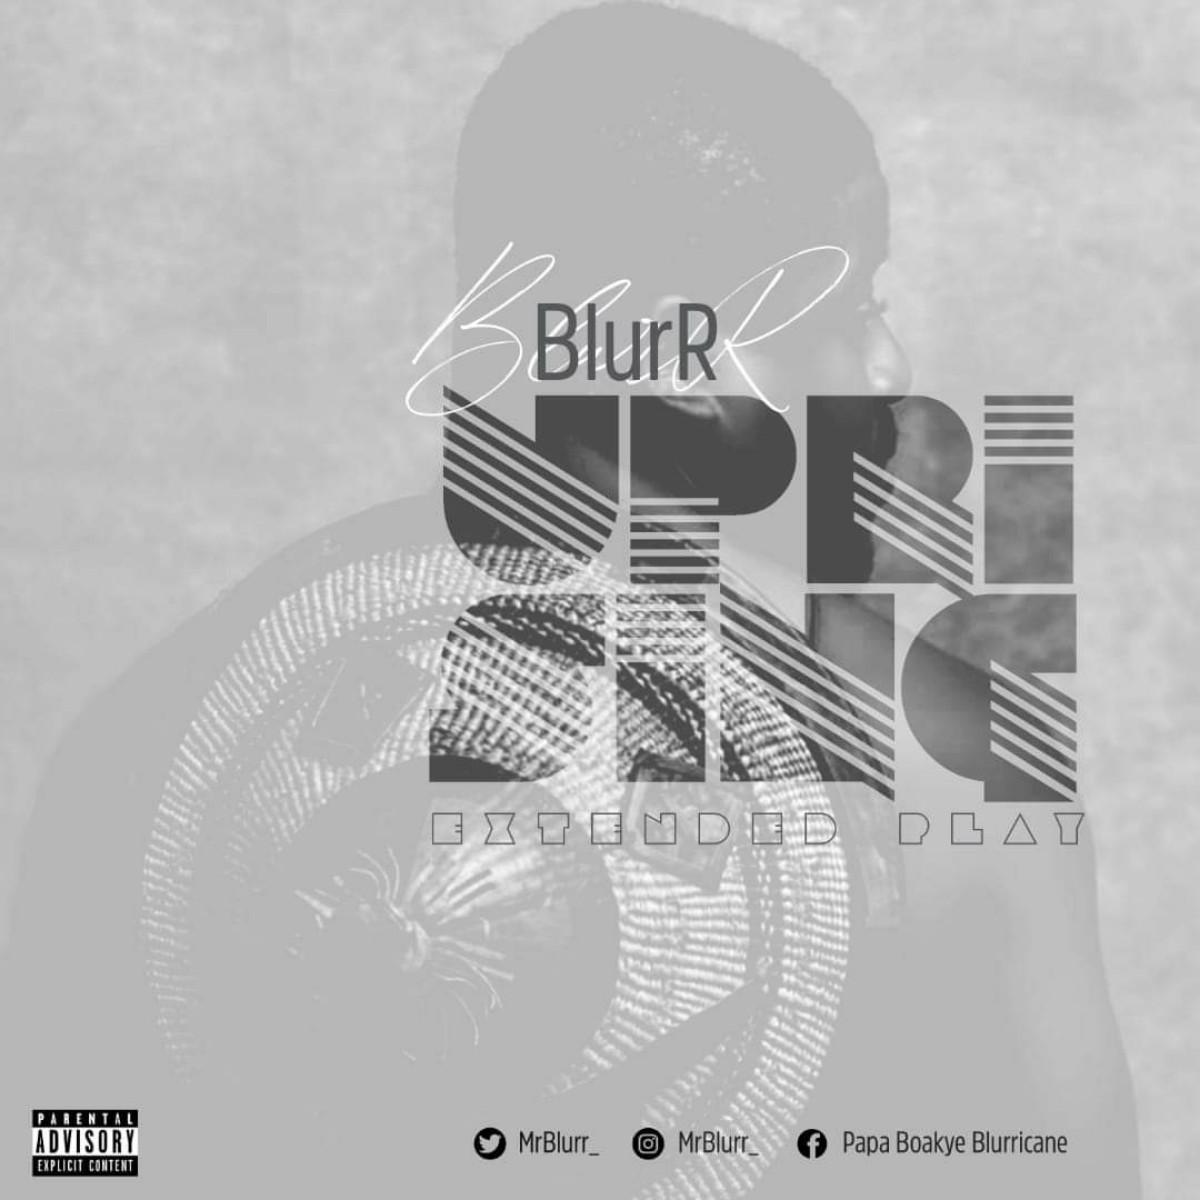 BlurR - UpRising EP